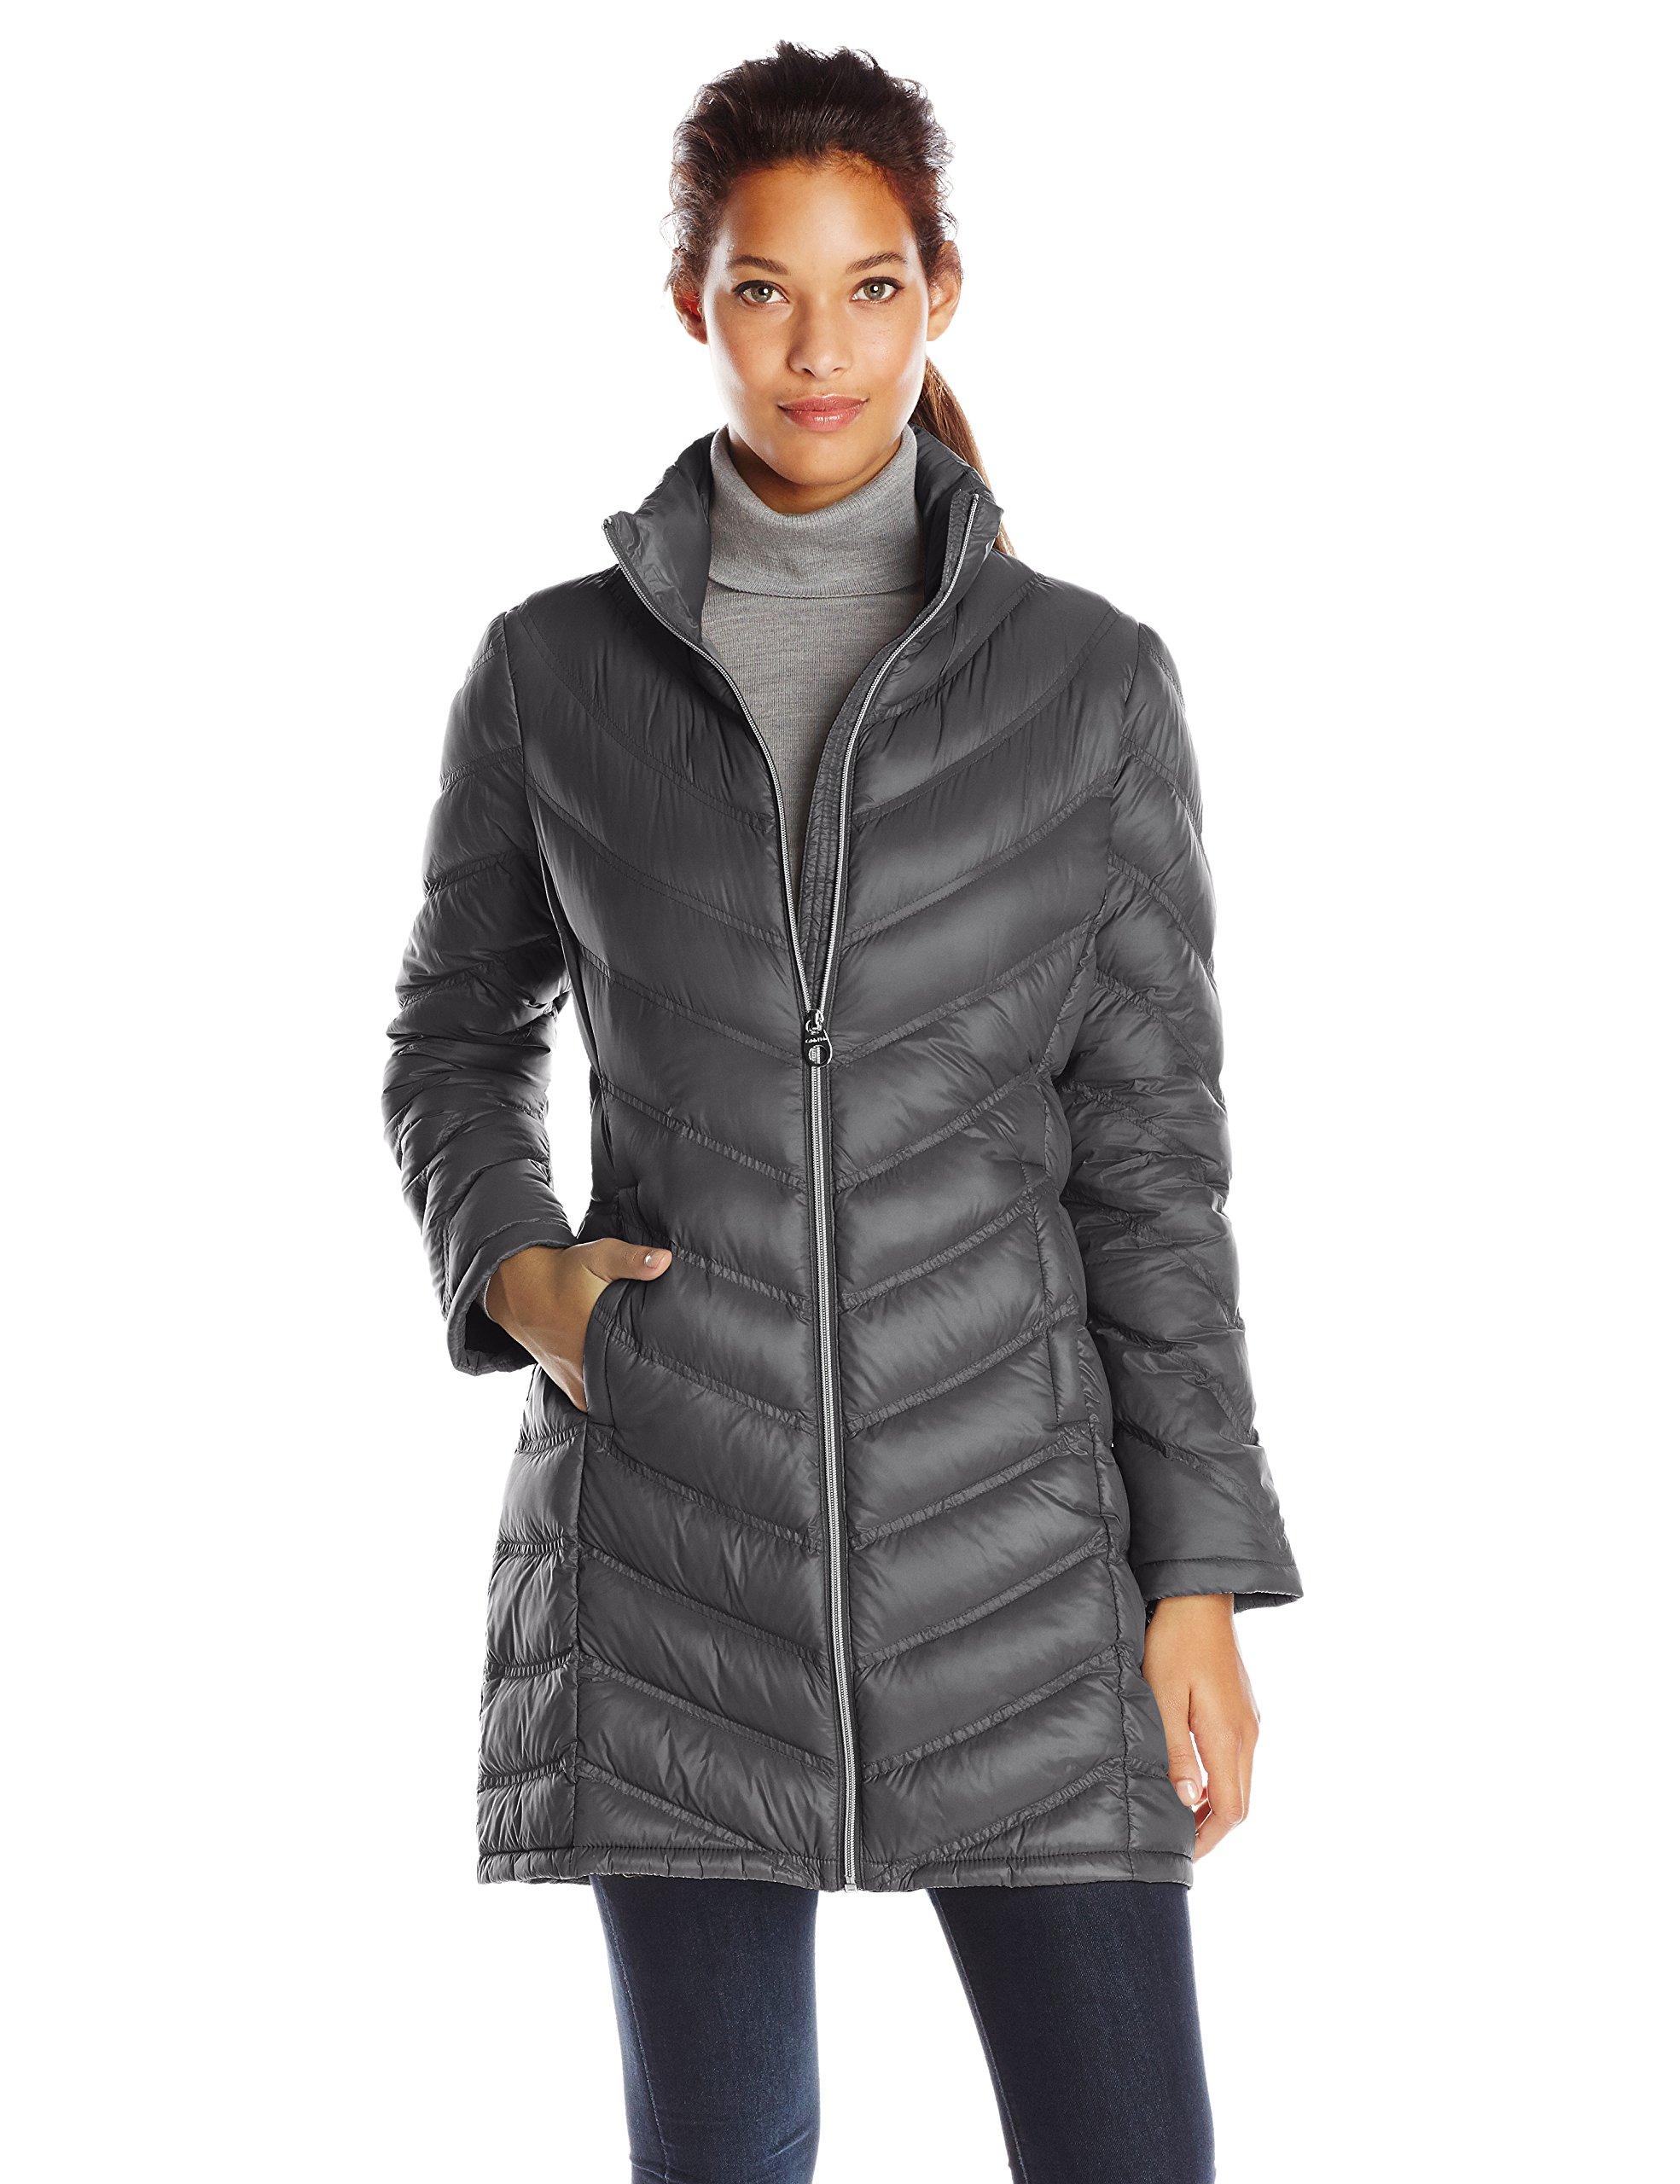 Calvin Klein Women's Chevron Packable Down Coat, Titanium, X-Small